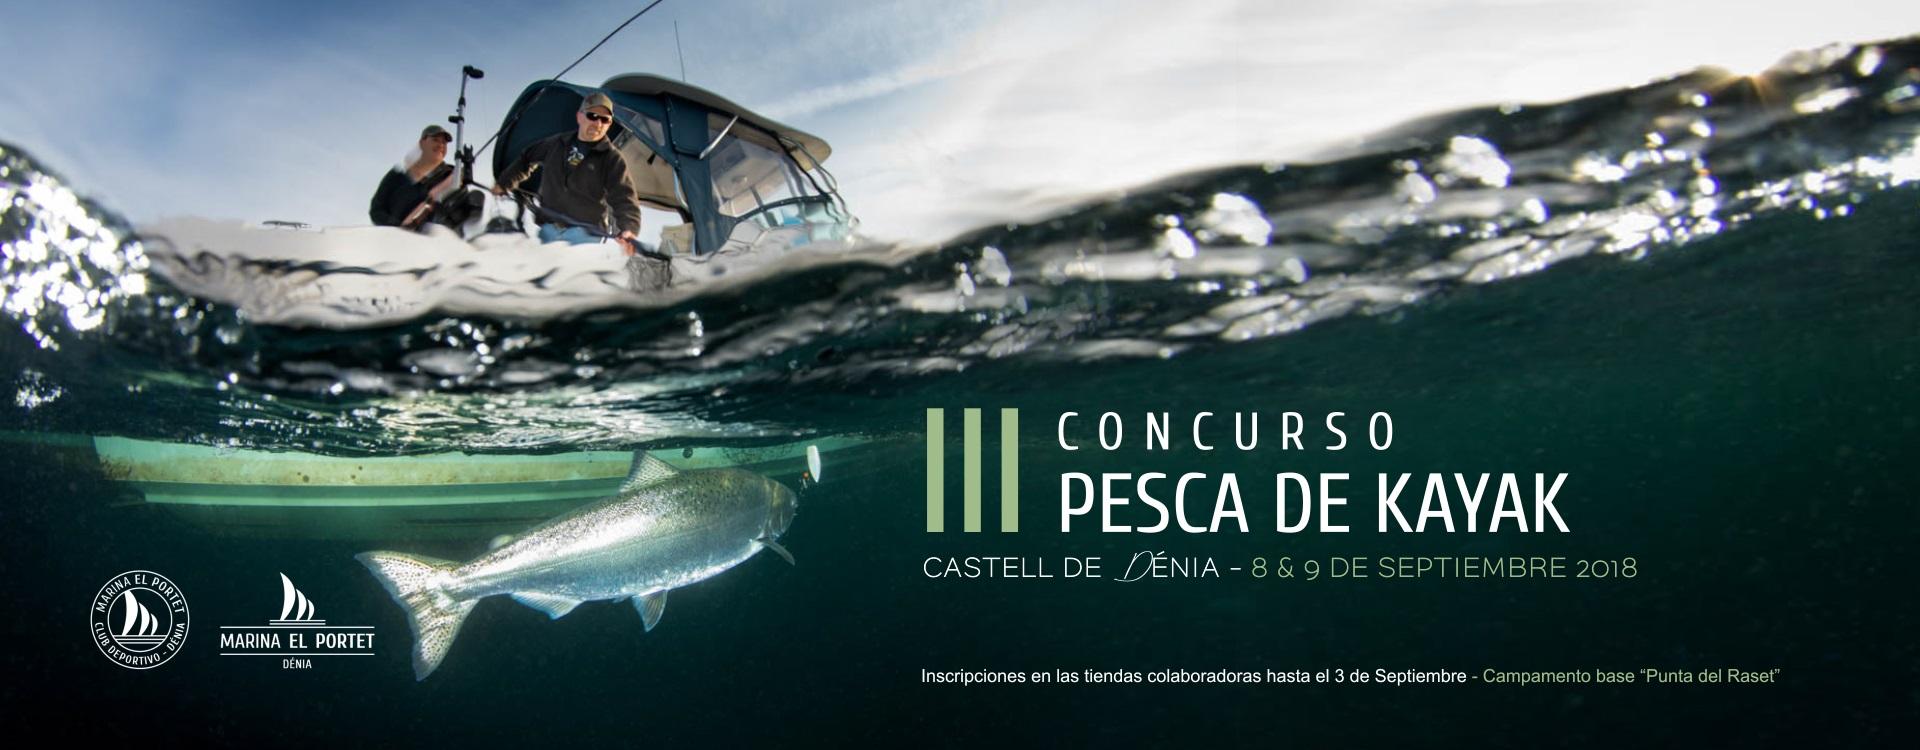 Joaquin Molpeceres III concurso de pesca de Kayak (el Portet Dénia) Joaquin Molpeceres